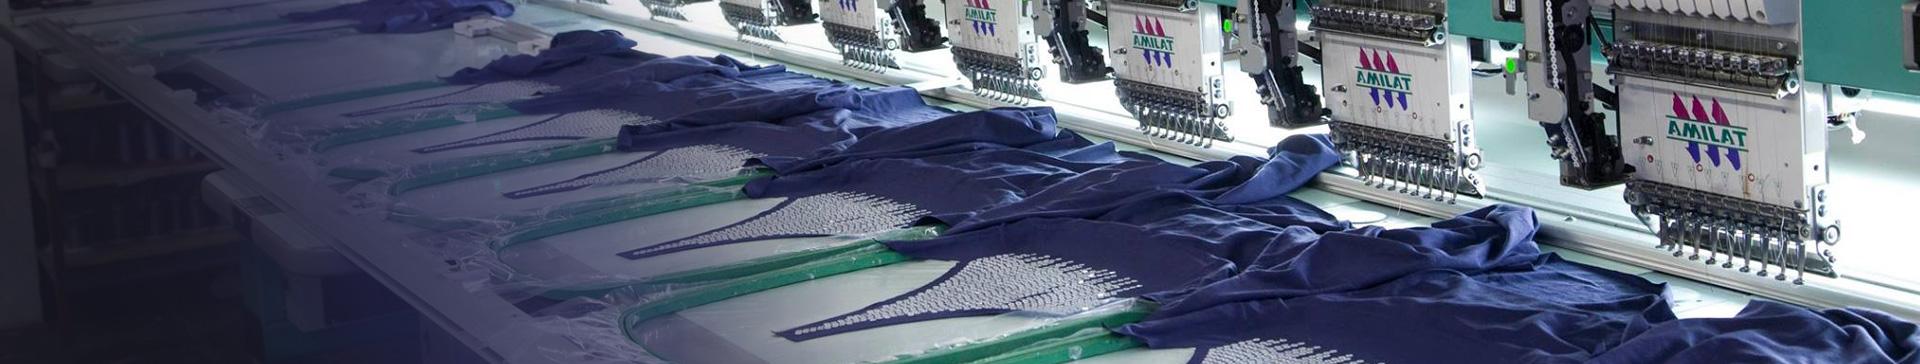 Camisetas no atacado | banner-bordado